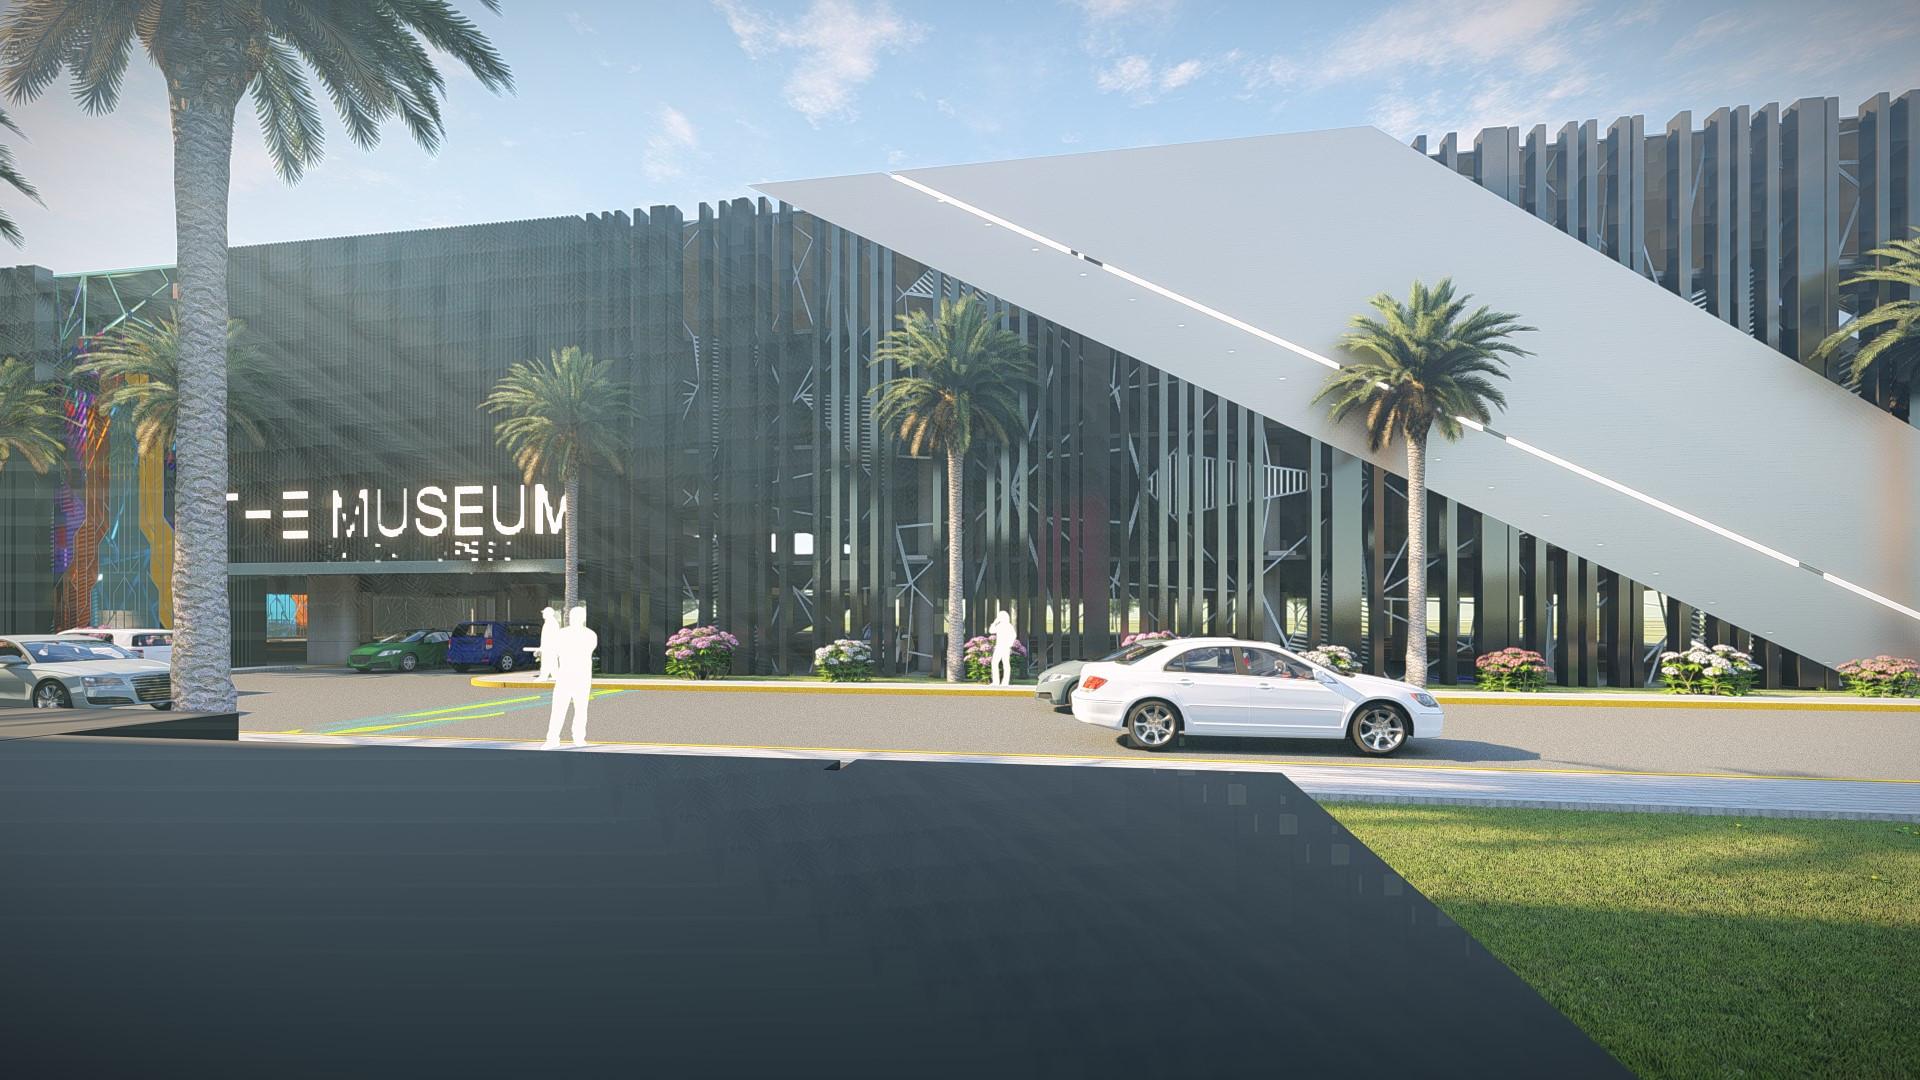 The Museum_Photo - 7.jpg